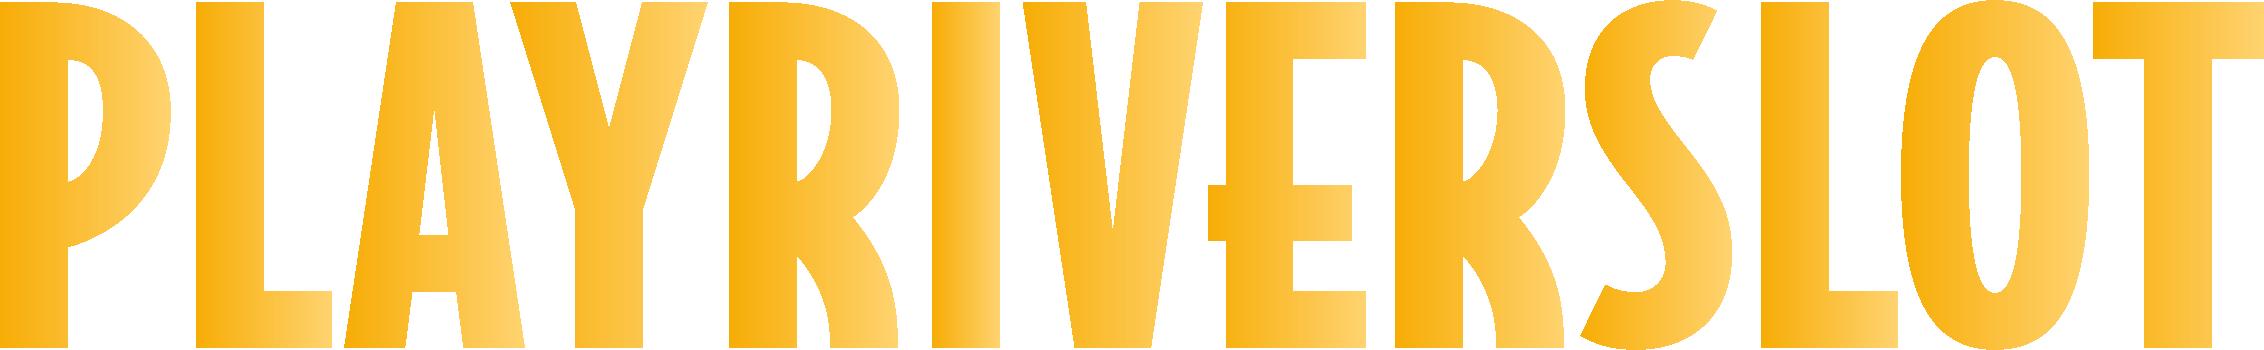 playriverslot logo